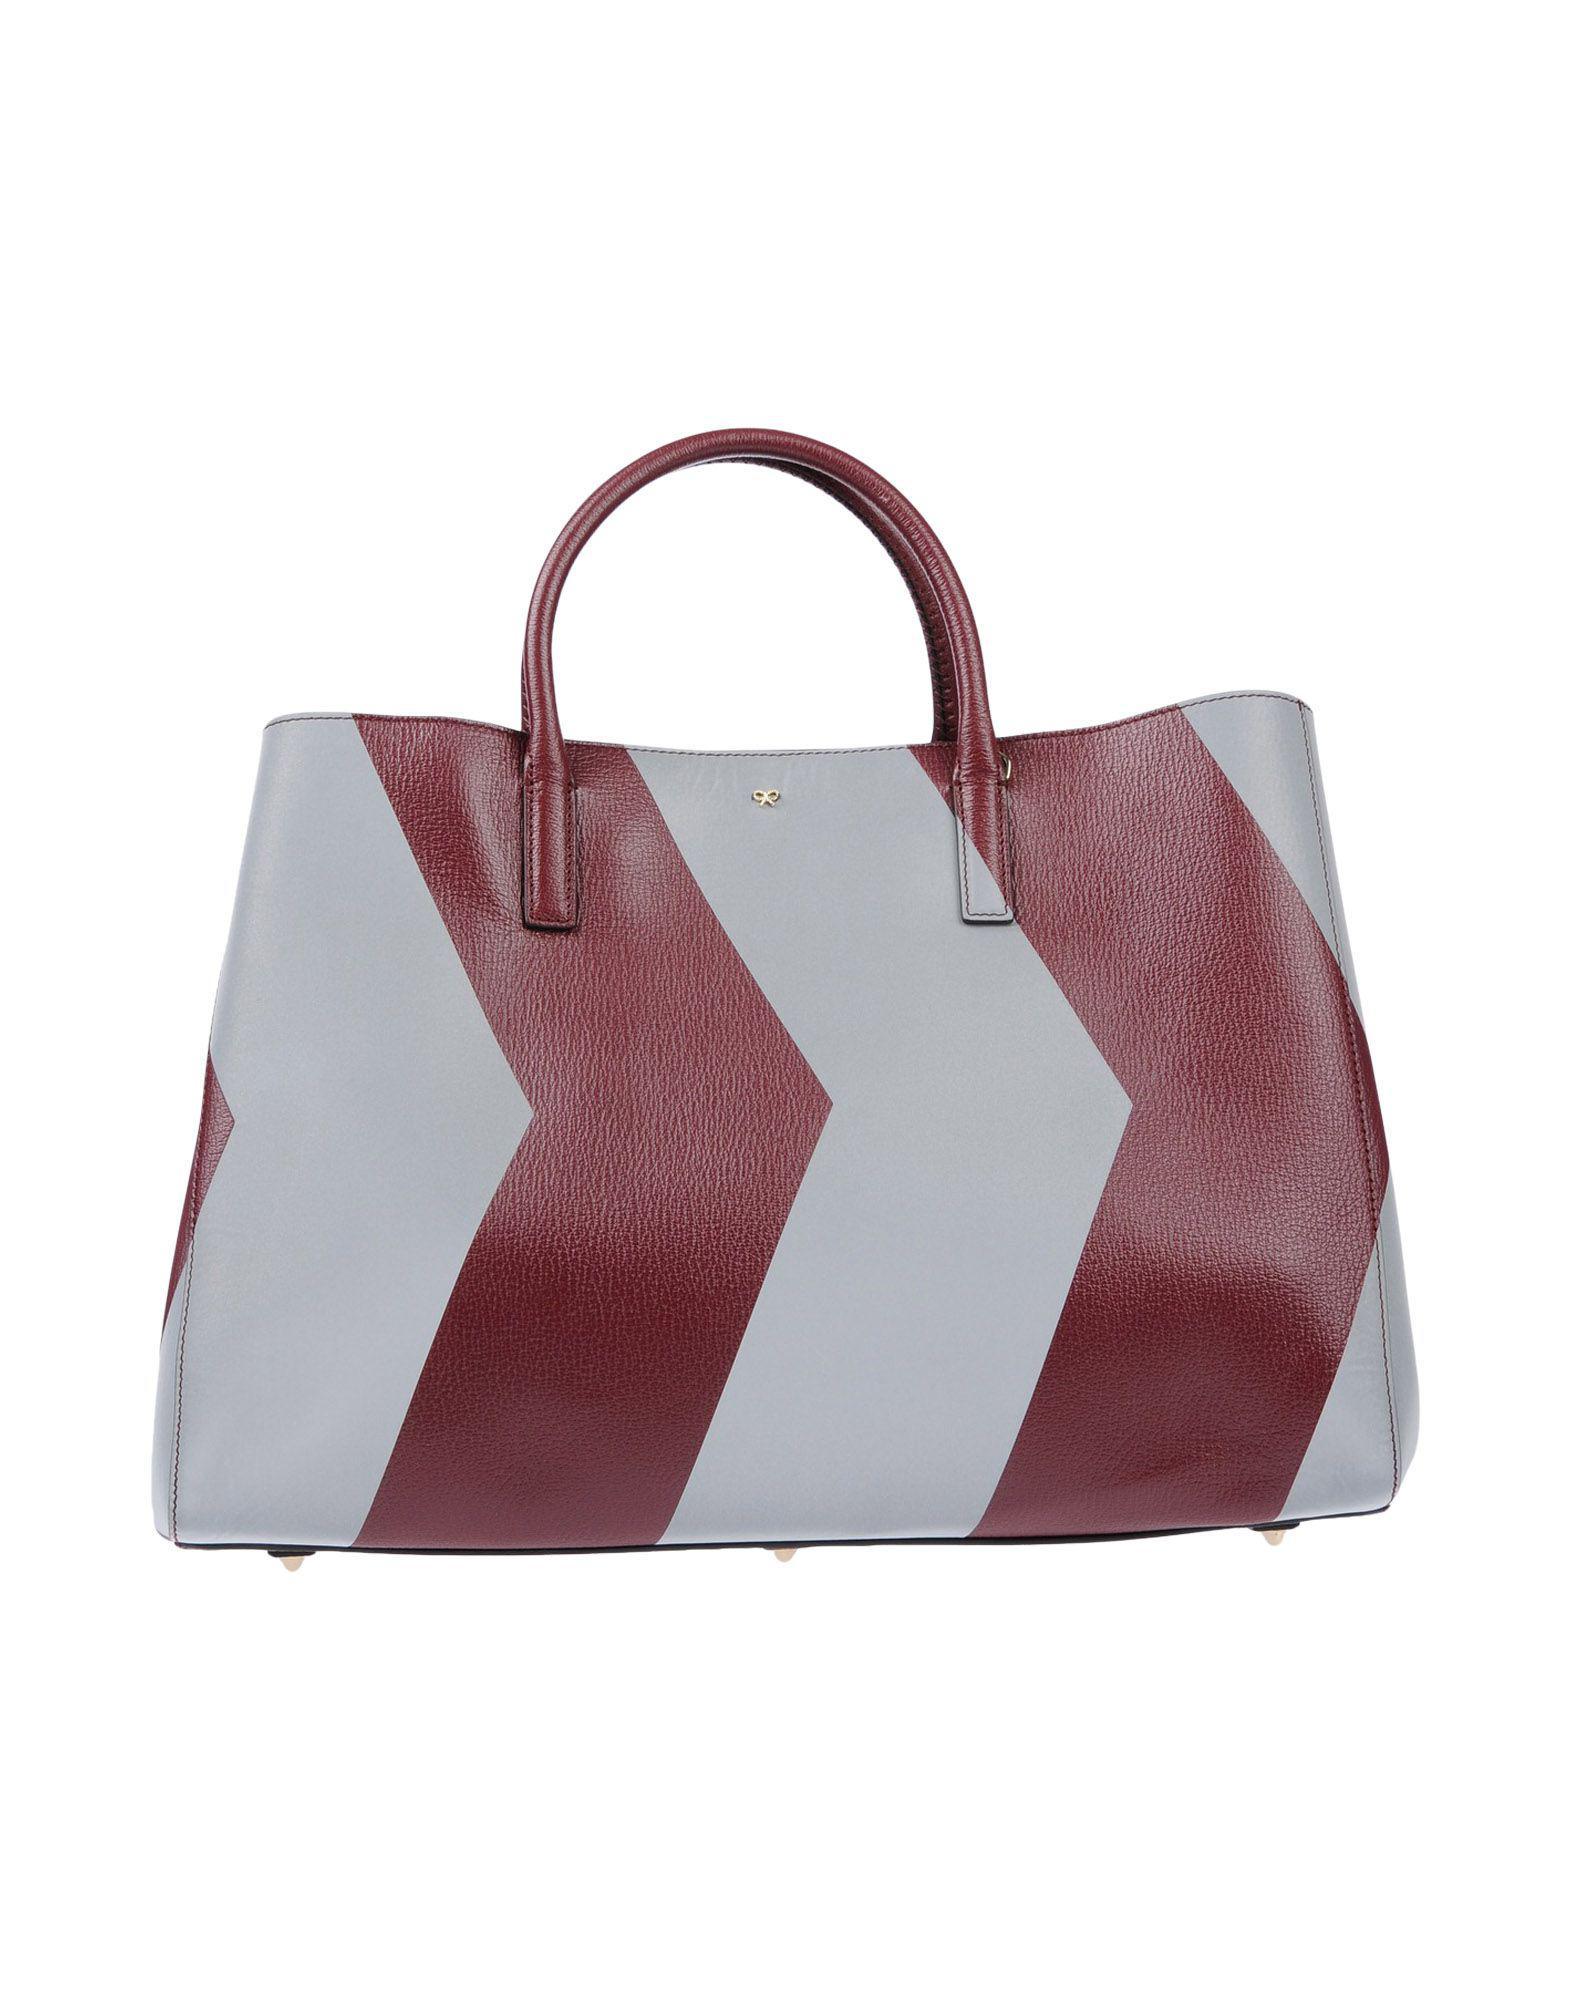 Anya Hindmarch Women S Handbags